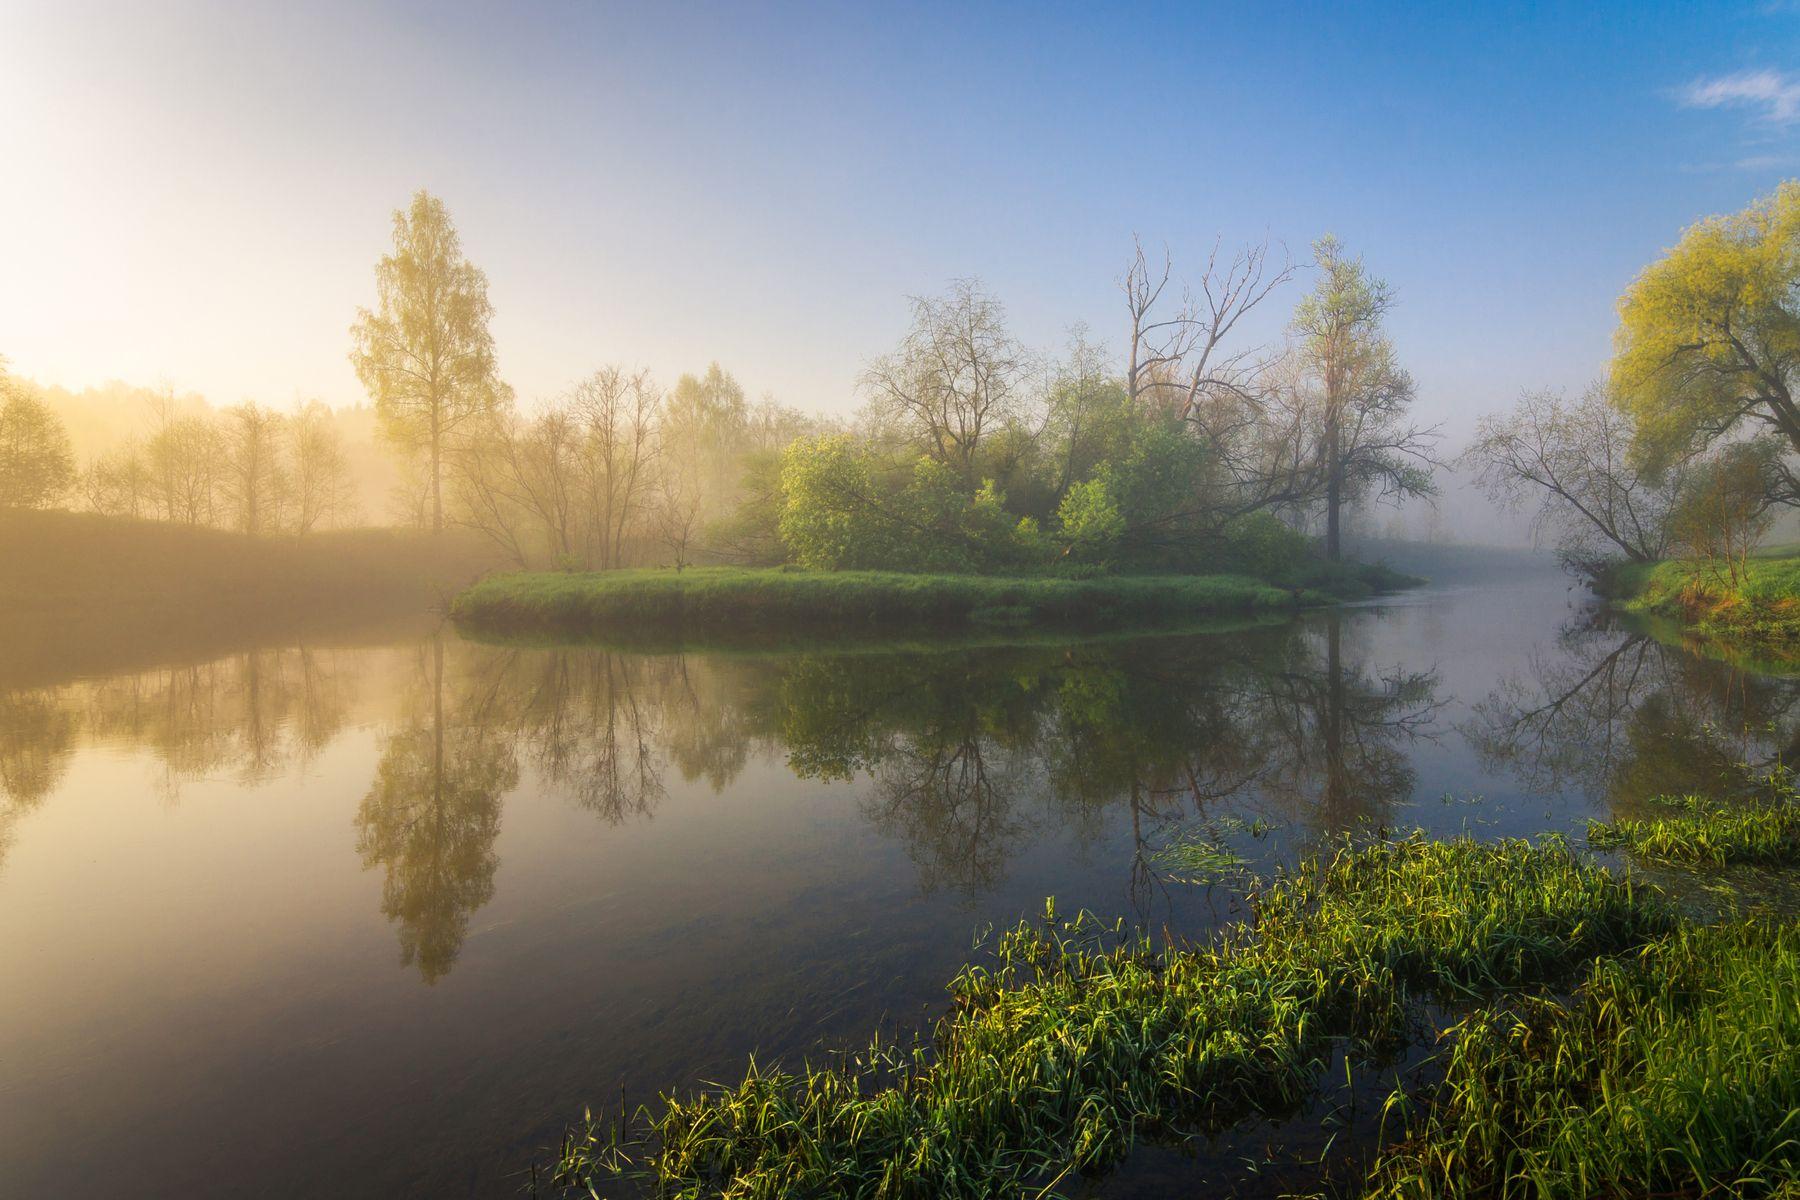 Майские туманы на Истре рассвет пейзаж река утро весна заря Истра май лето туман восход